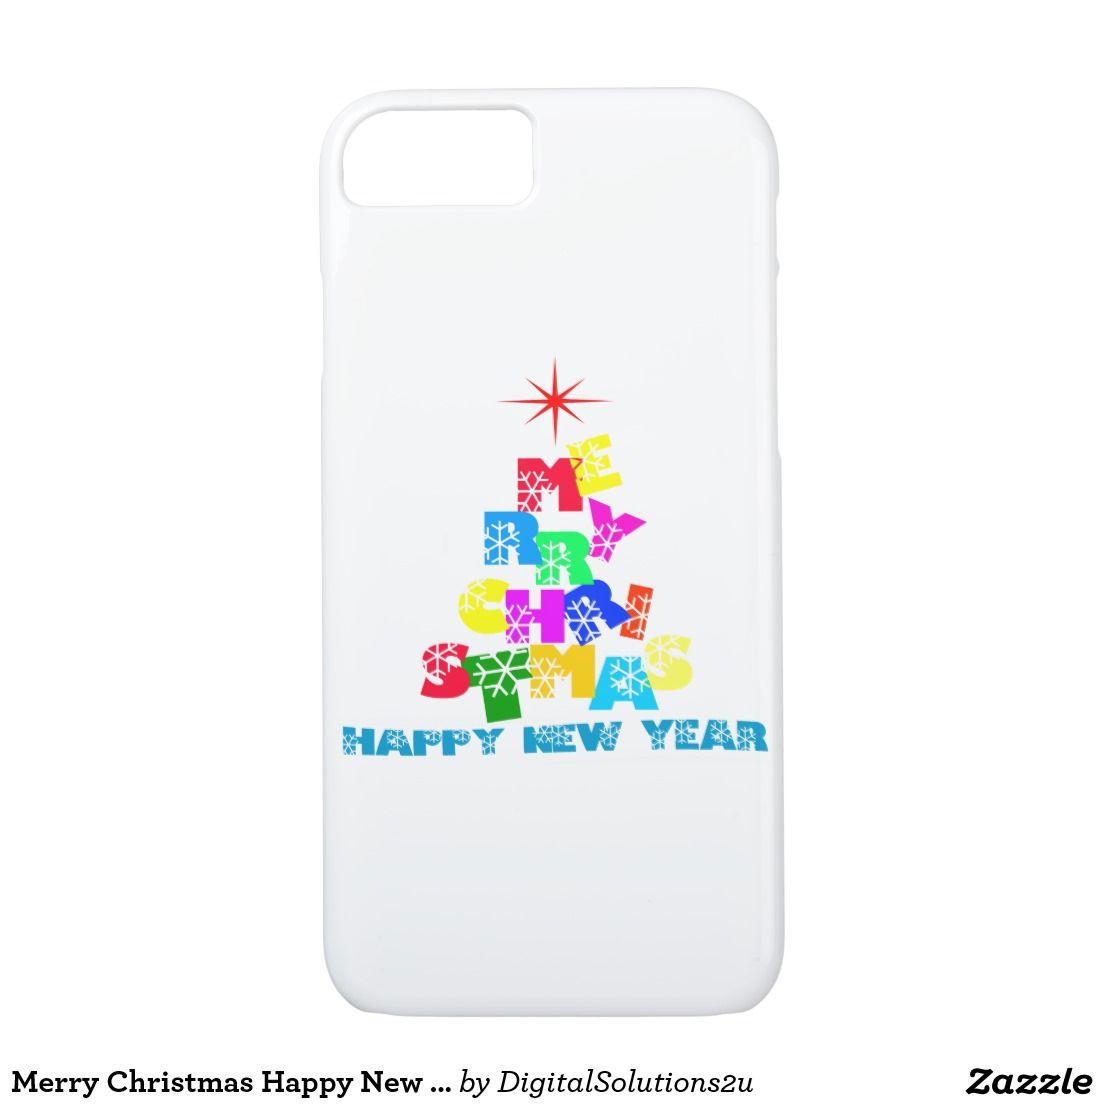 Merry Christmas Happy New Year iPhone 7 Case   Electronics   Pinterest